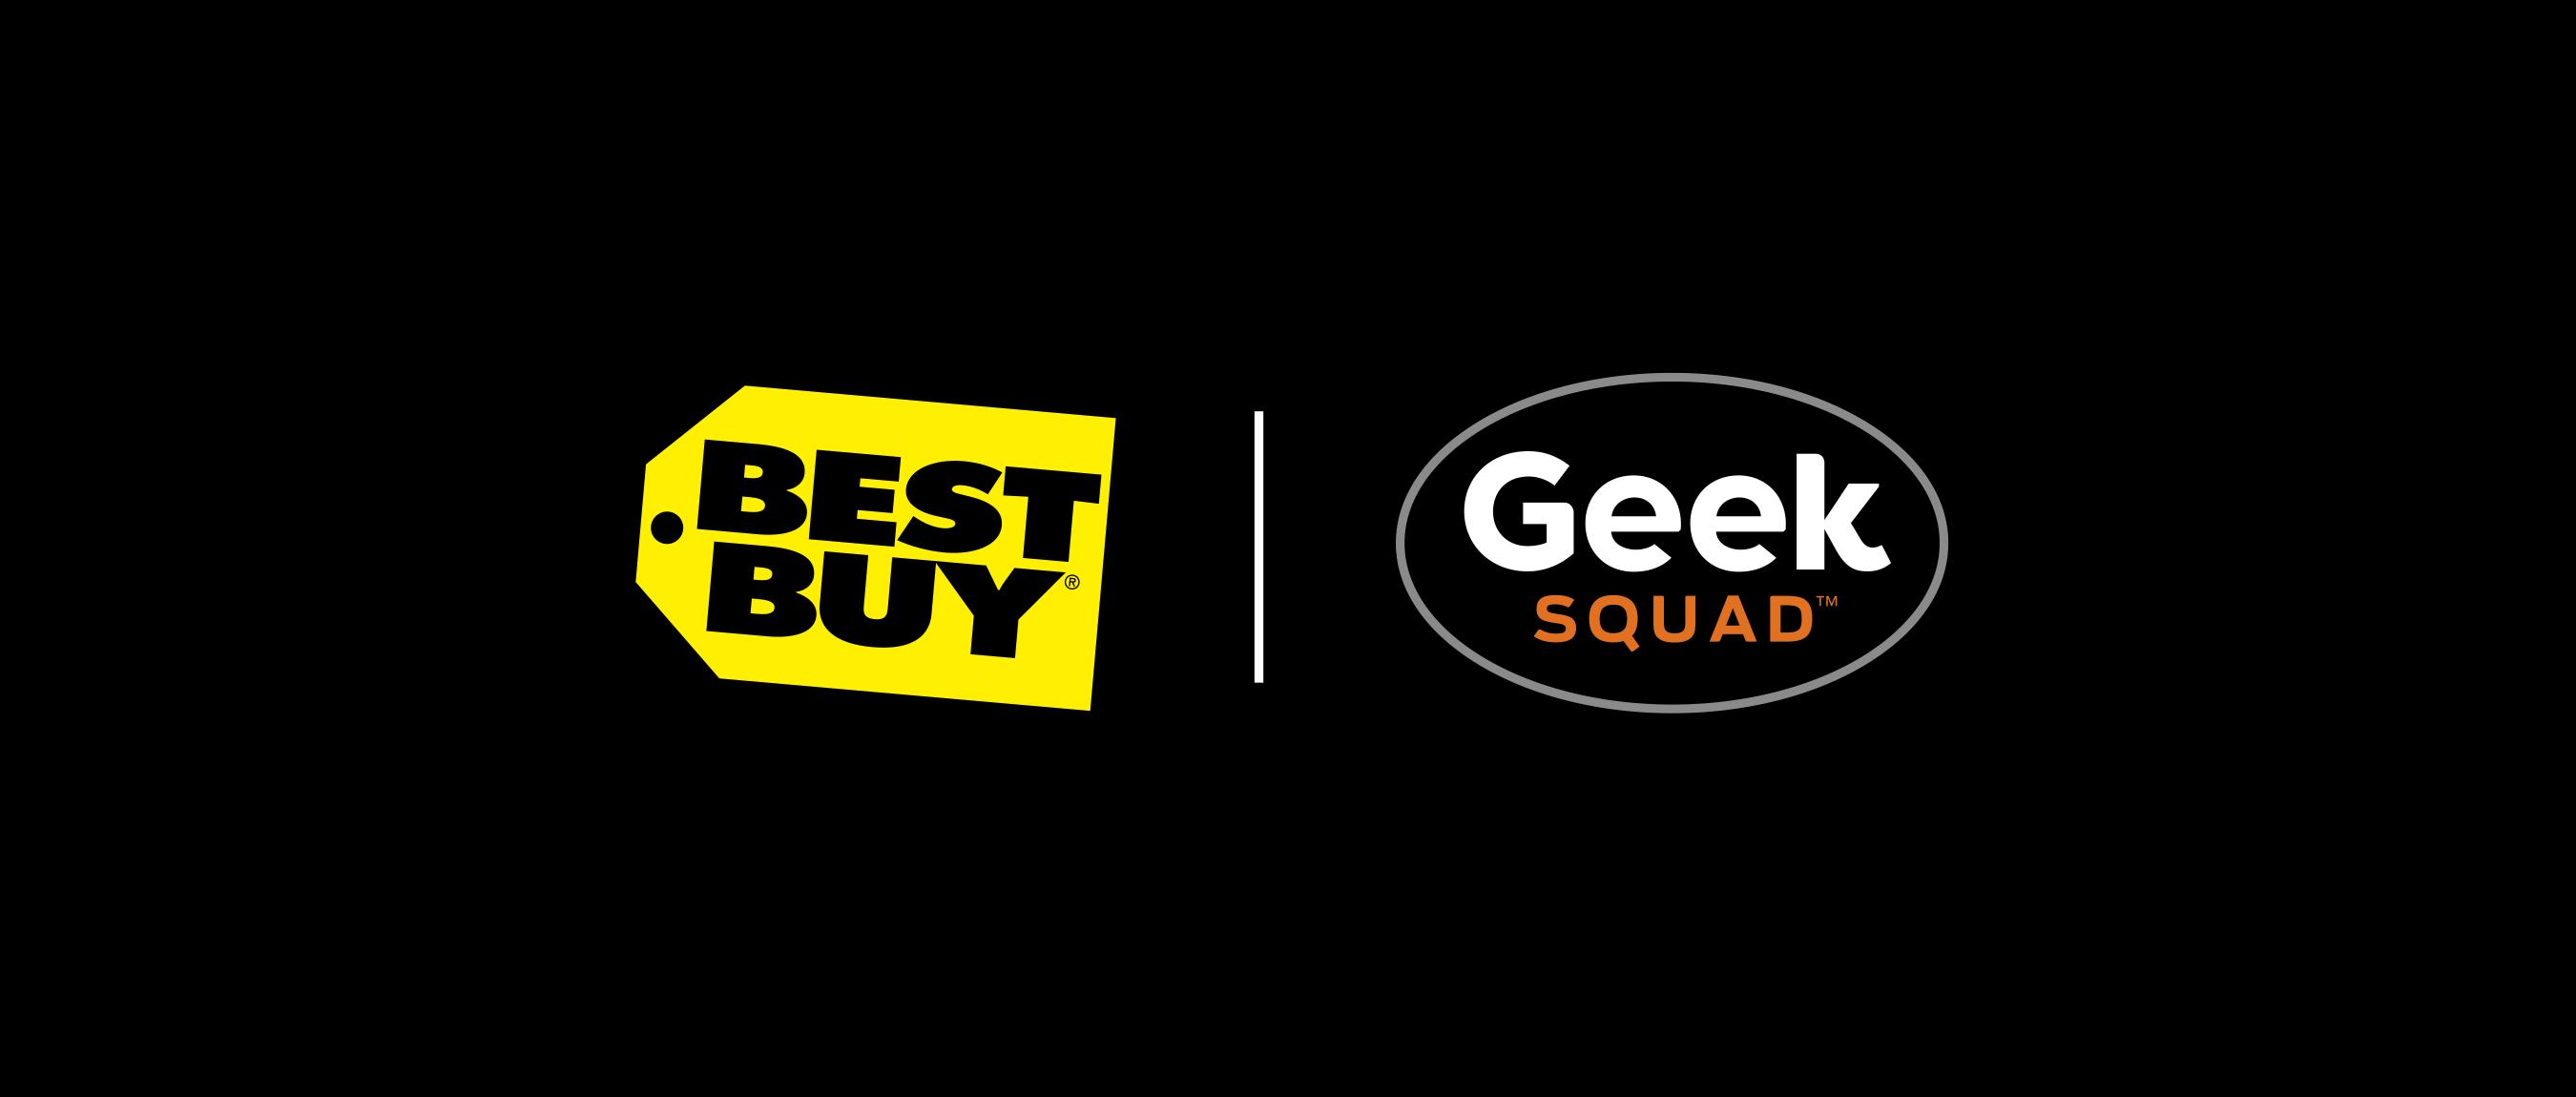 Geek Squad.